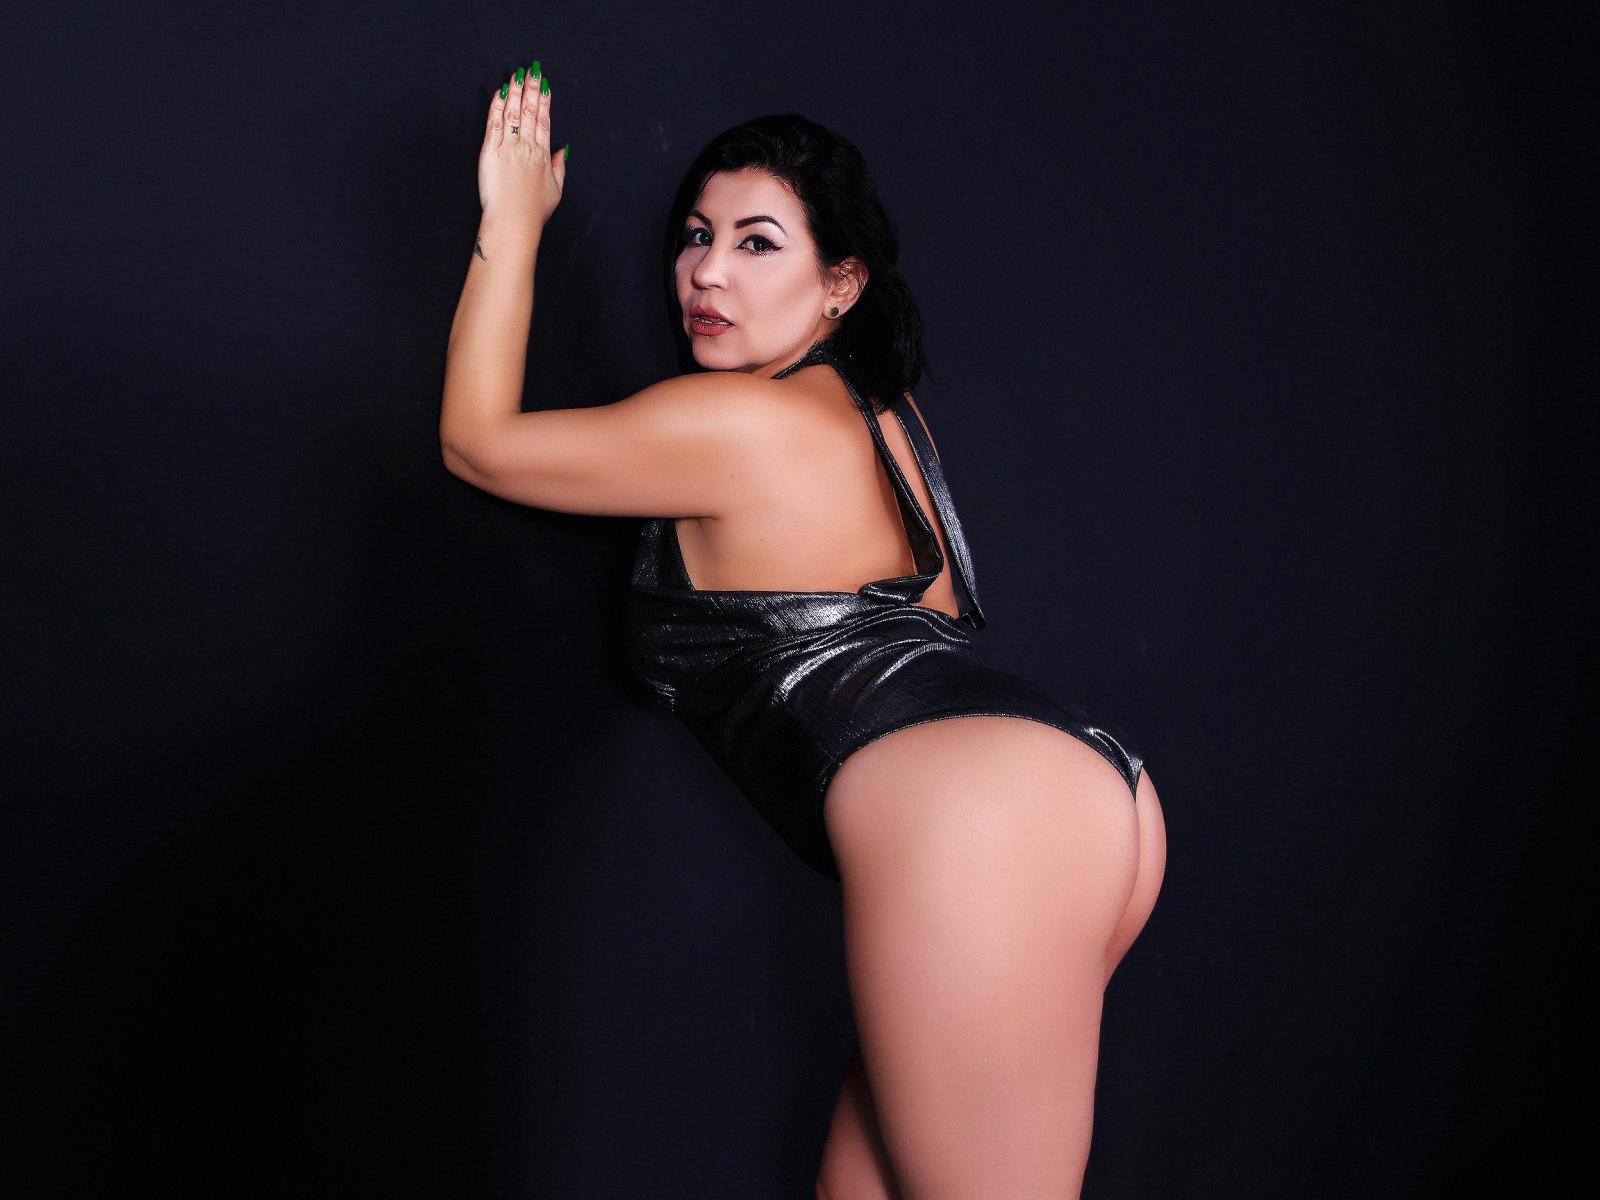 Milf Πρωκτικό πορνό φωτογραφία γυναίκες μουνί